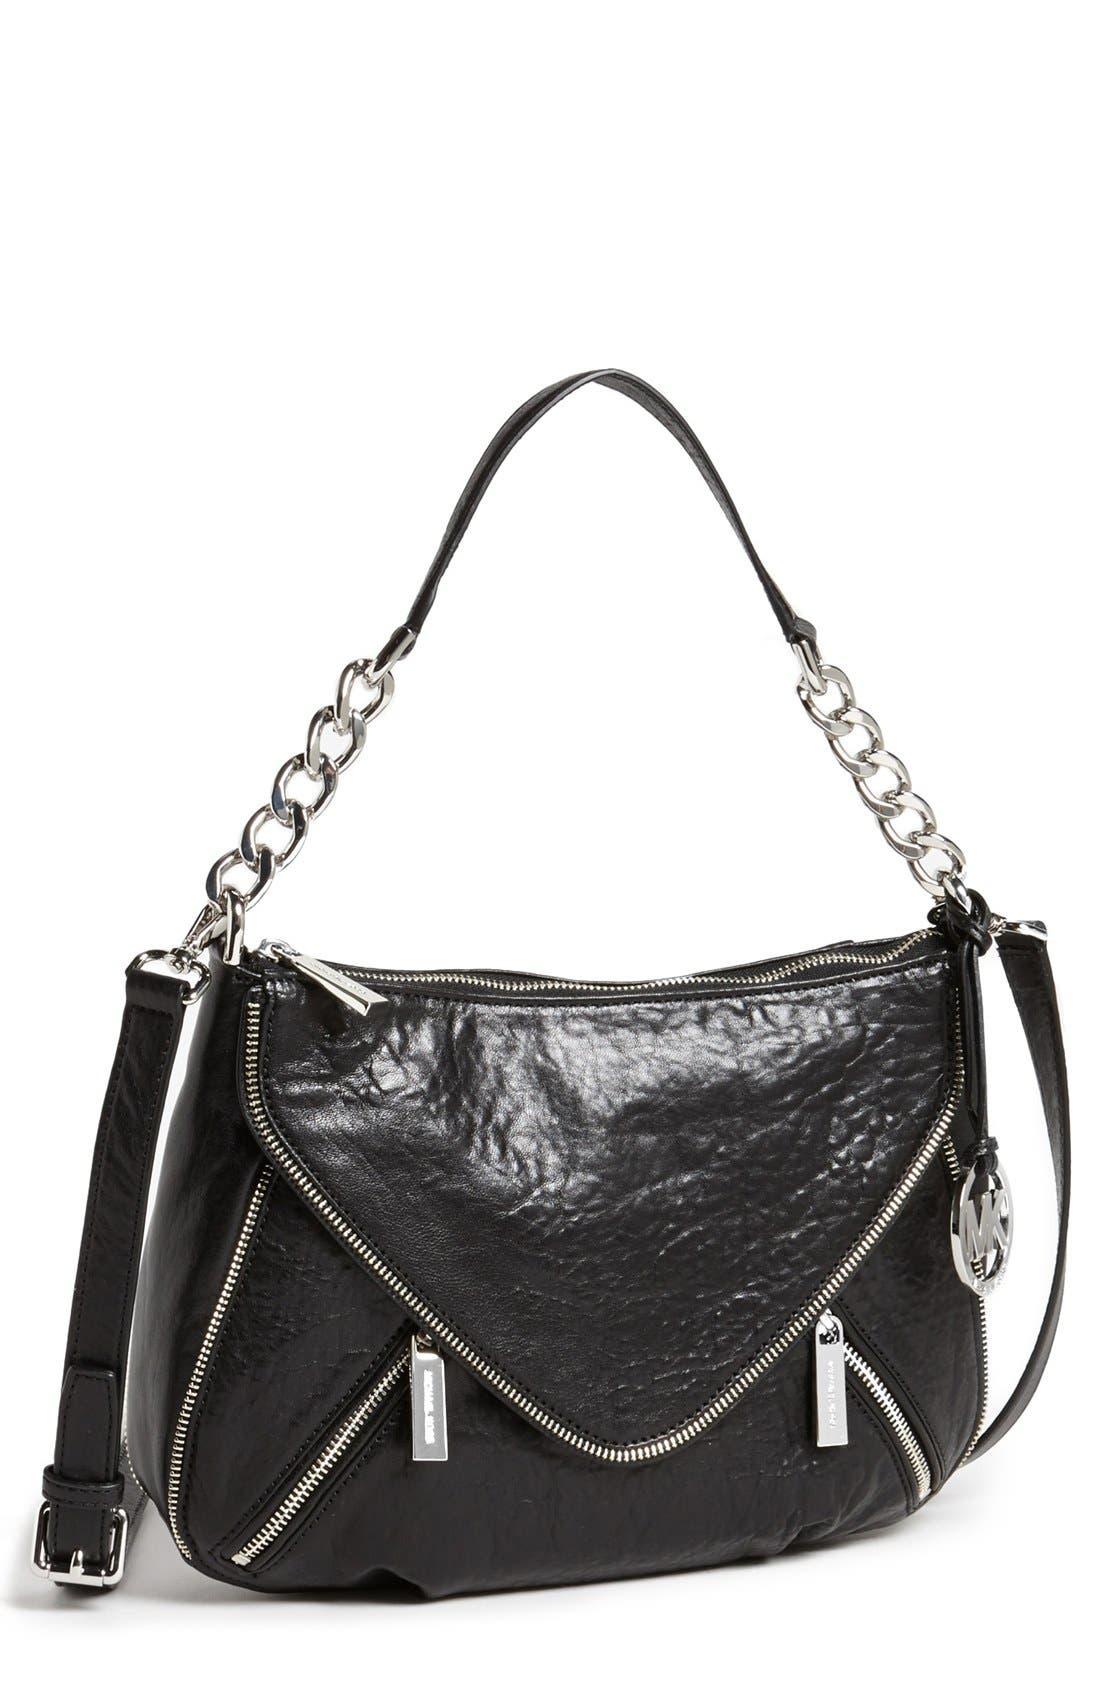 Alternate Image 1 Selected - MICHAEL Michael Kors 'Odette - Medium' Leather Crossbody Bag